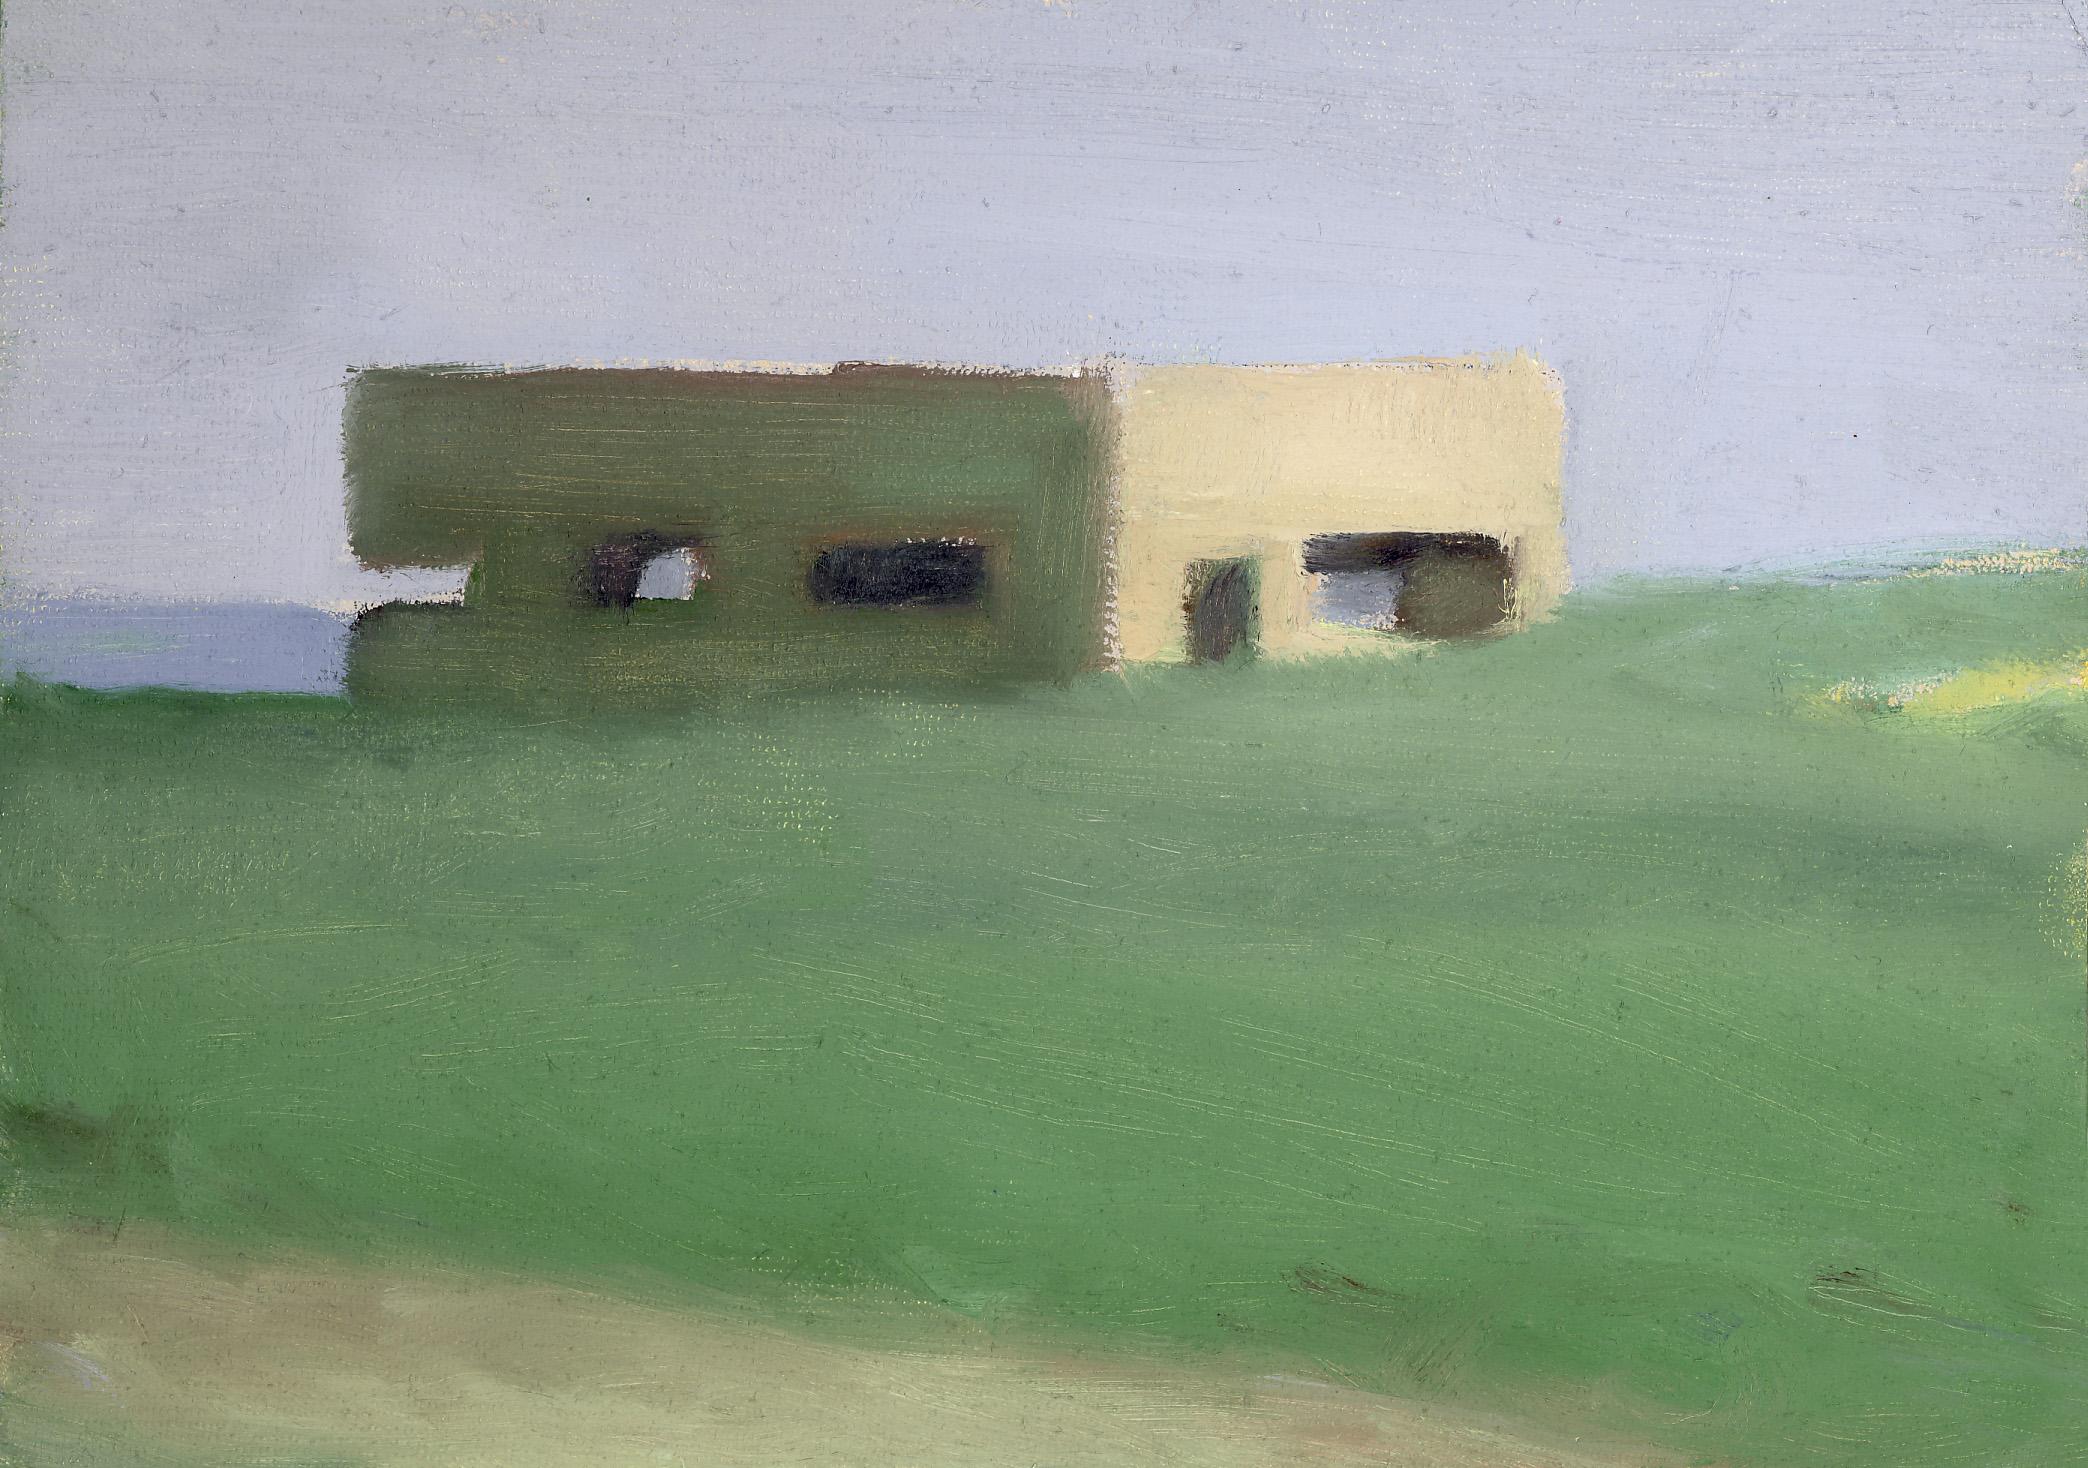 Pillbox at Rye #2